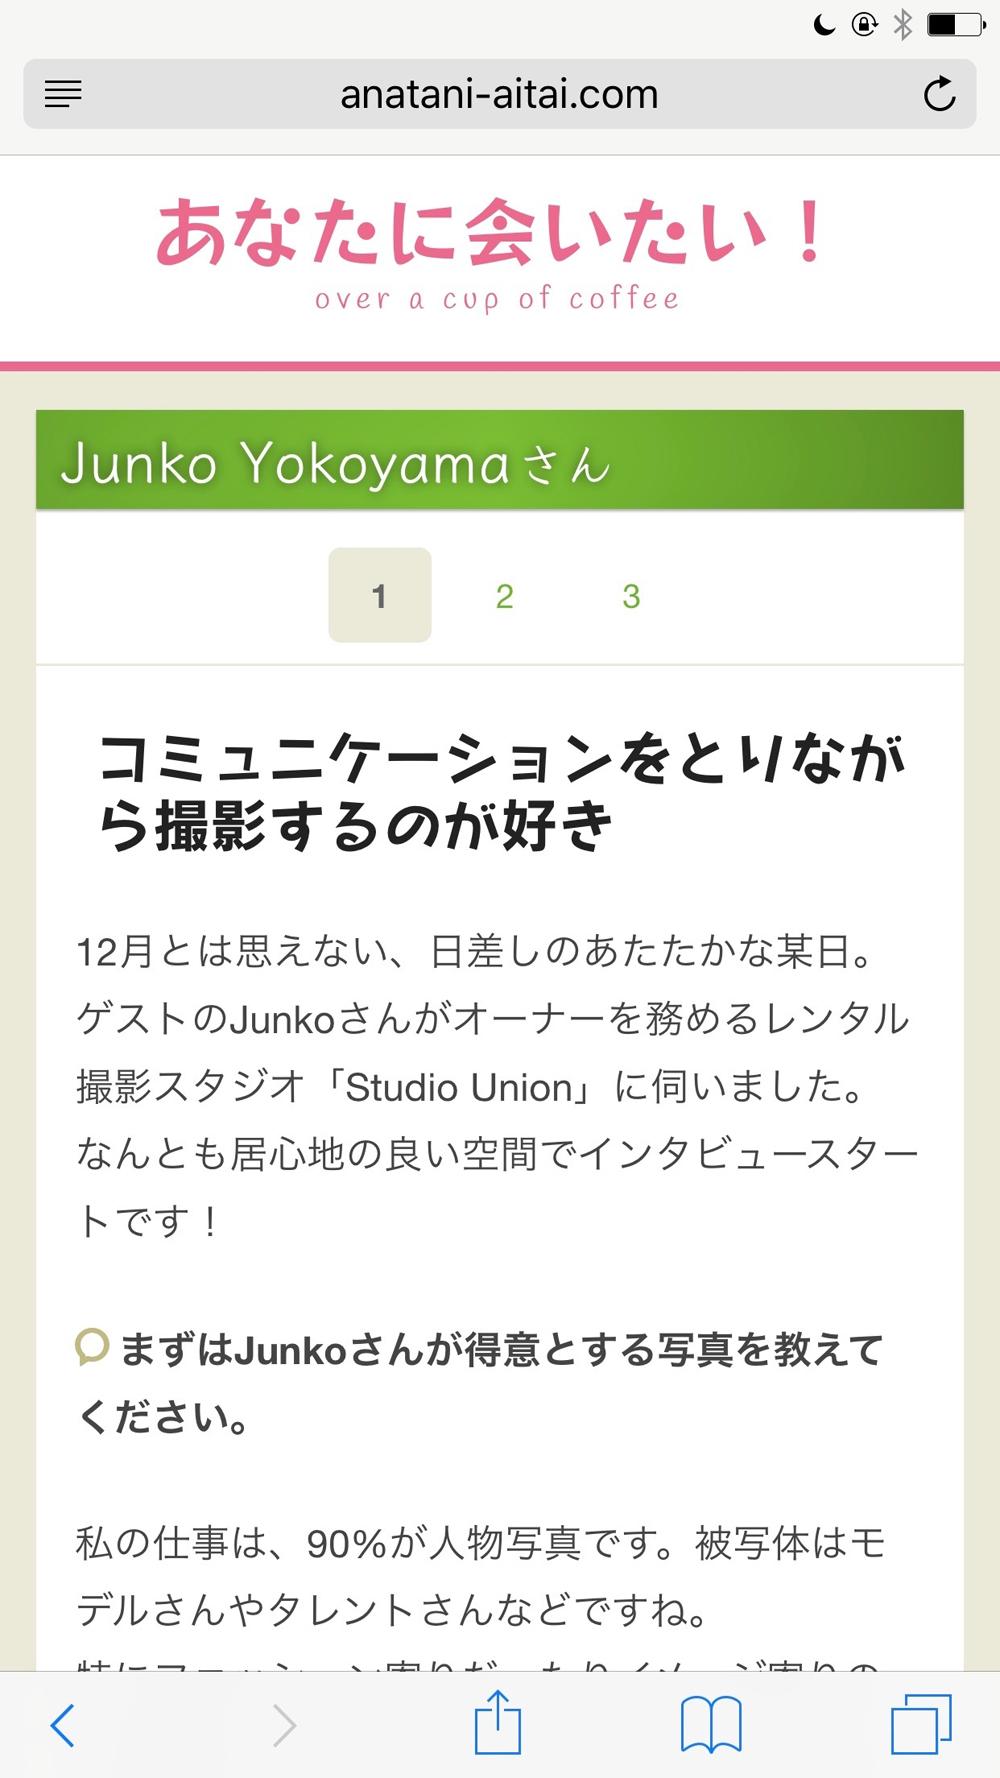 https://news.mynavi.jp/itsearch/2017/02/09/sbt005.jpg